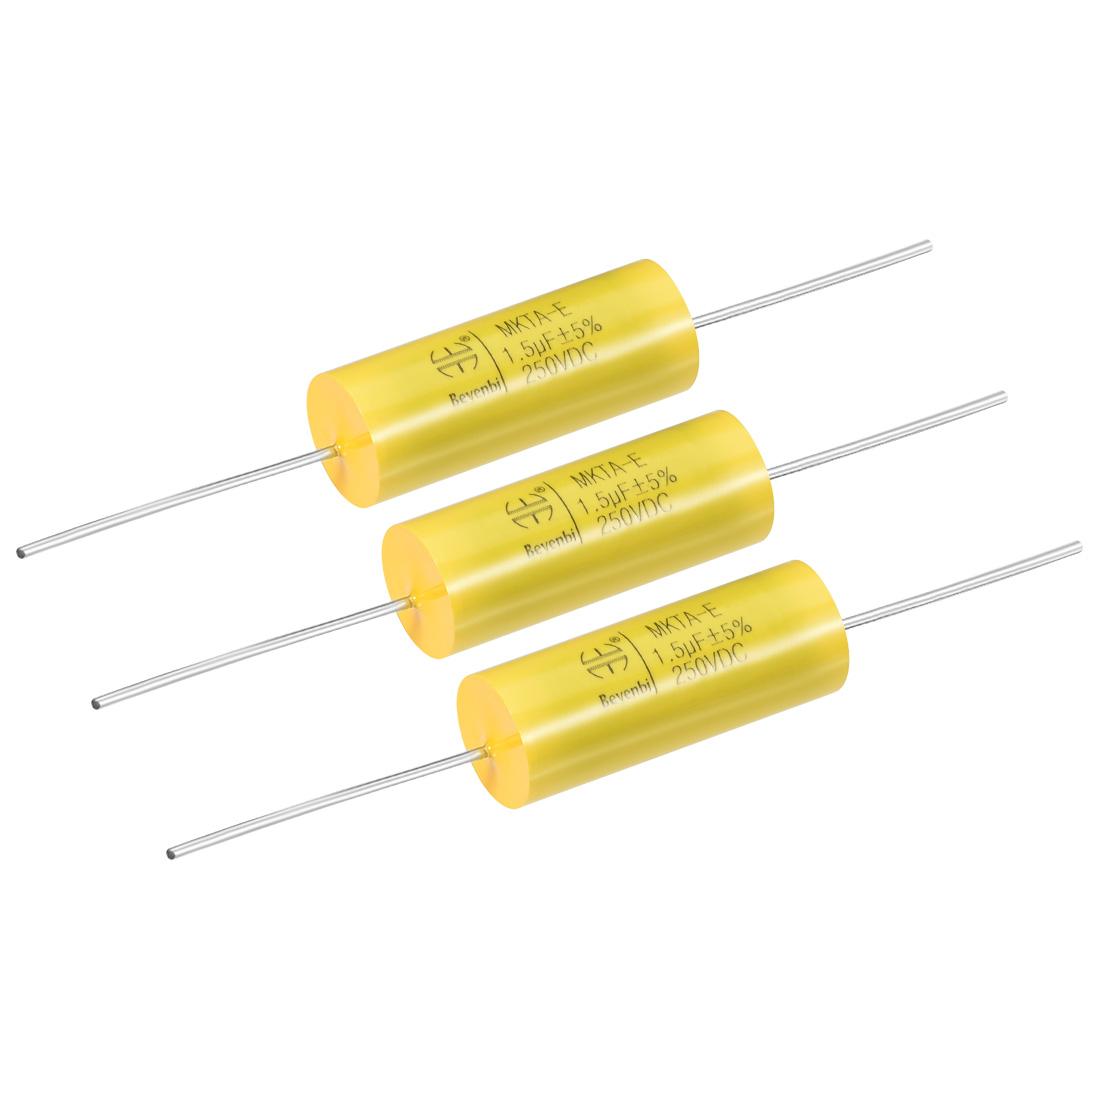 Film Capacitor 250V DC 1.5uF MKTA-E Round Polypropylene Capacitors Yellow 3pcs